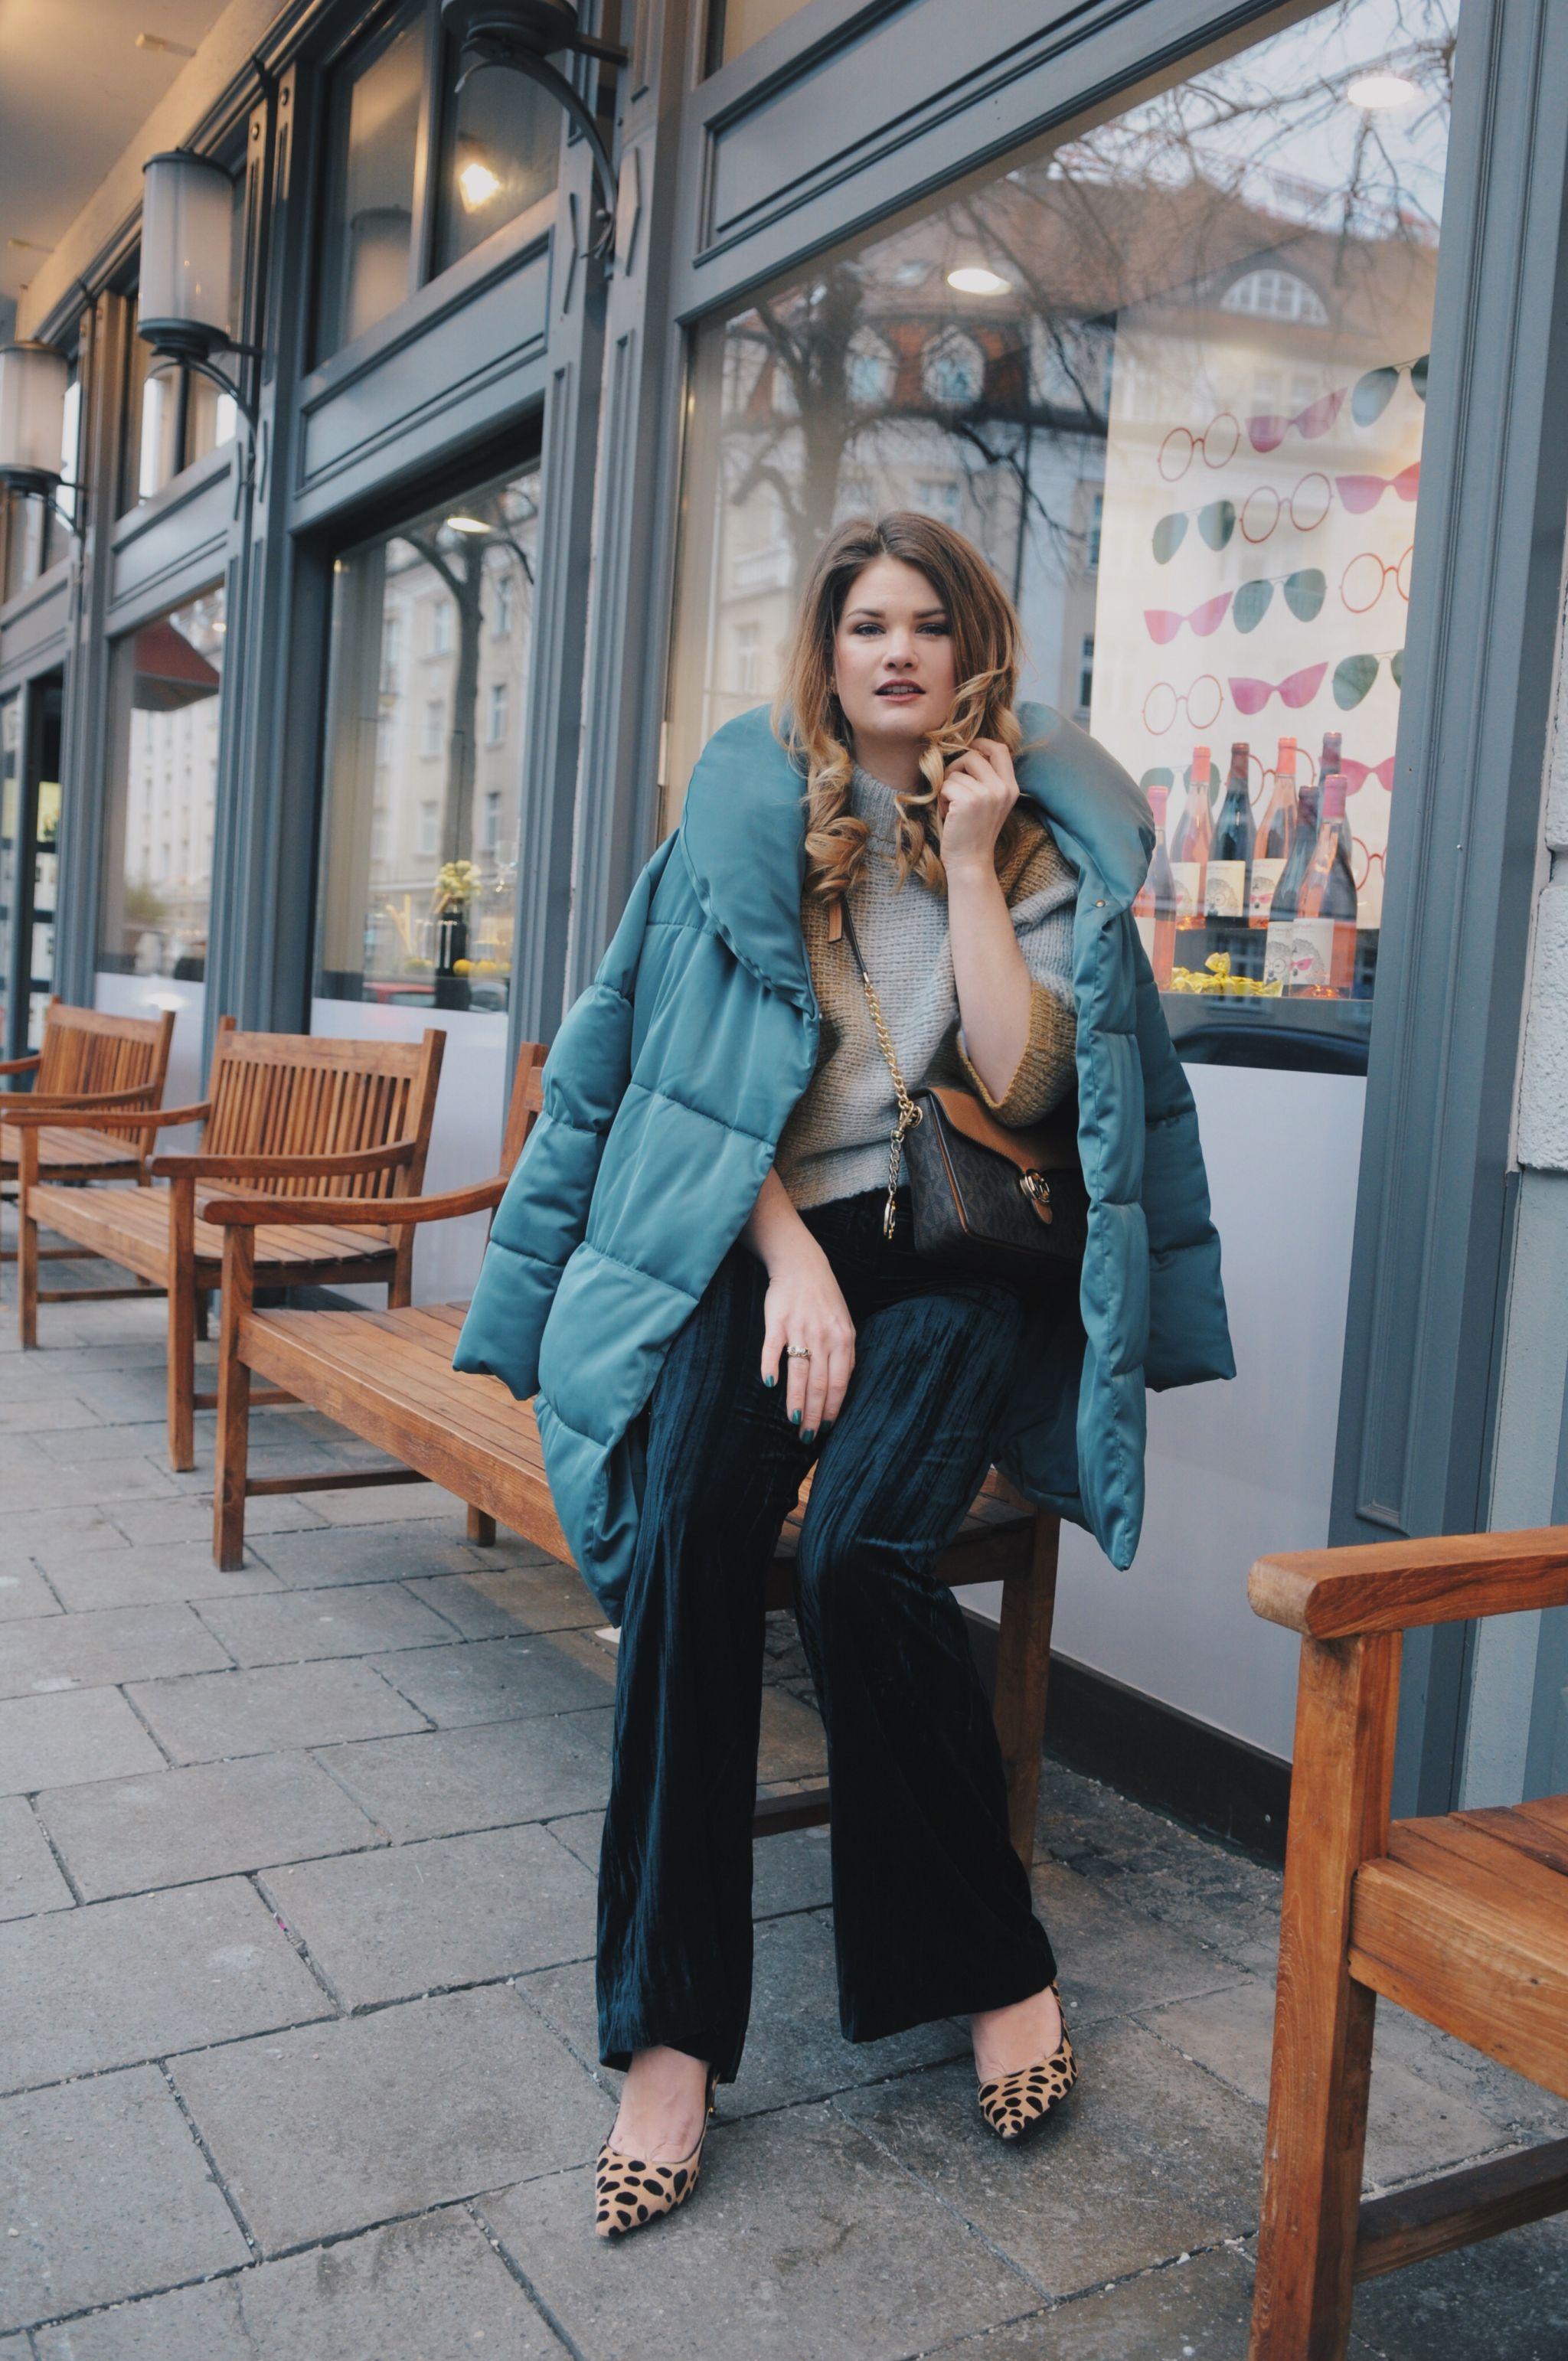 Shades of Green – Oversize Padded Jacket, Velvet Pants und Tom Ford Leo Pumps